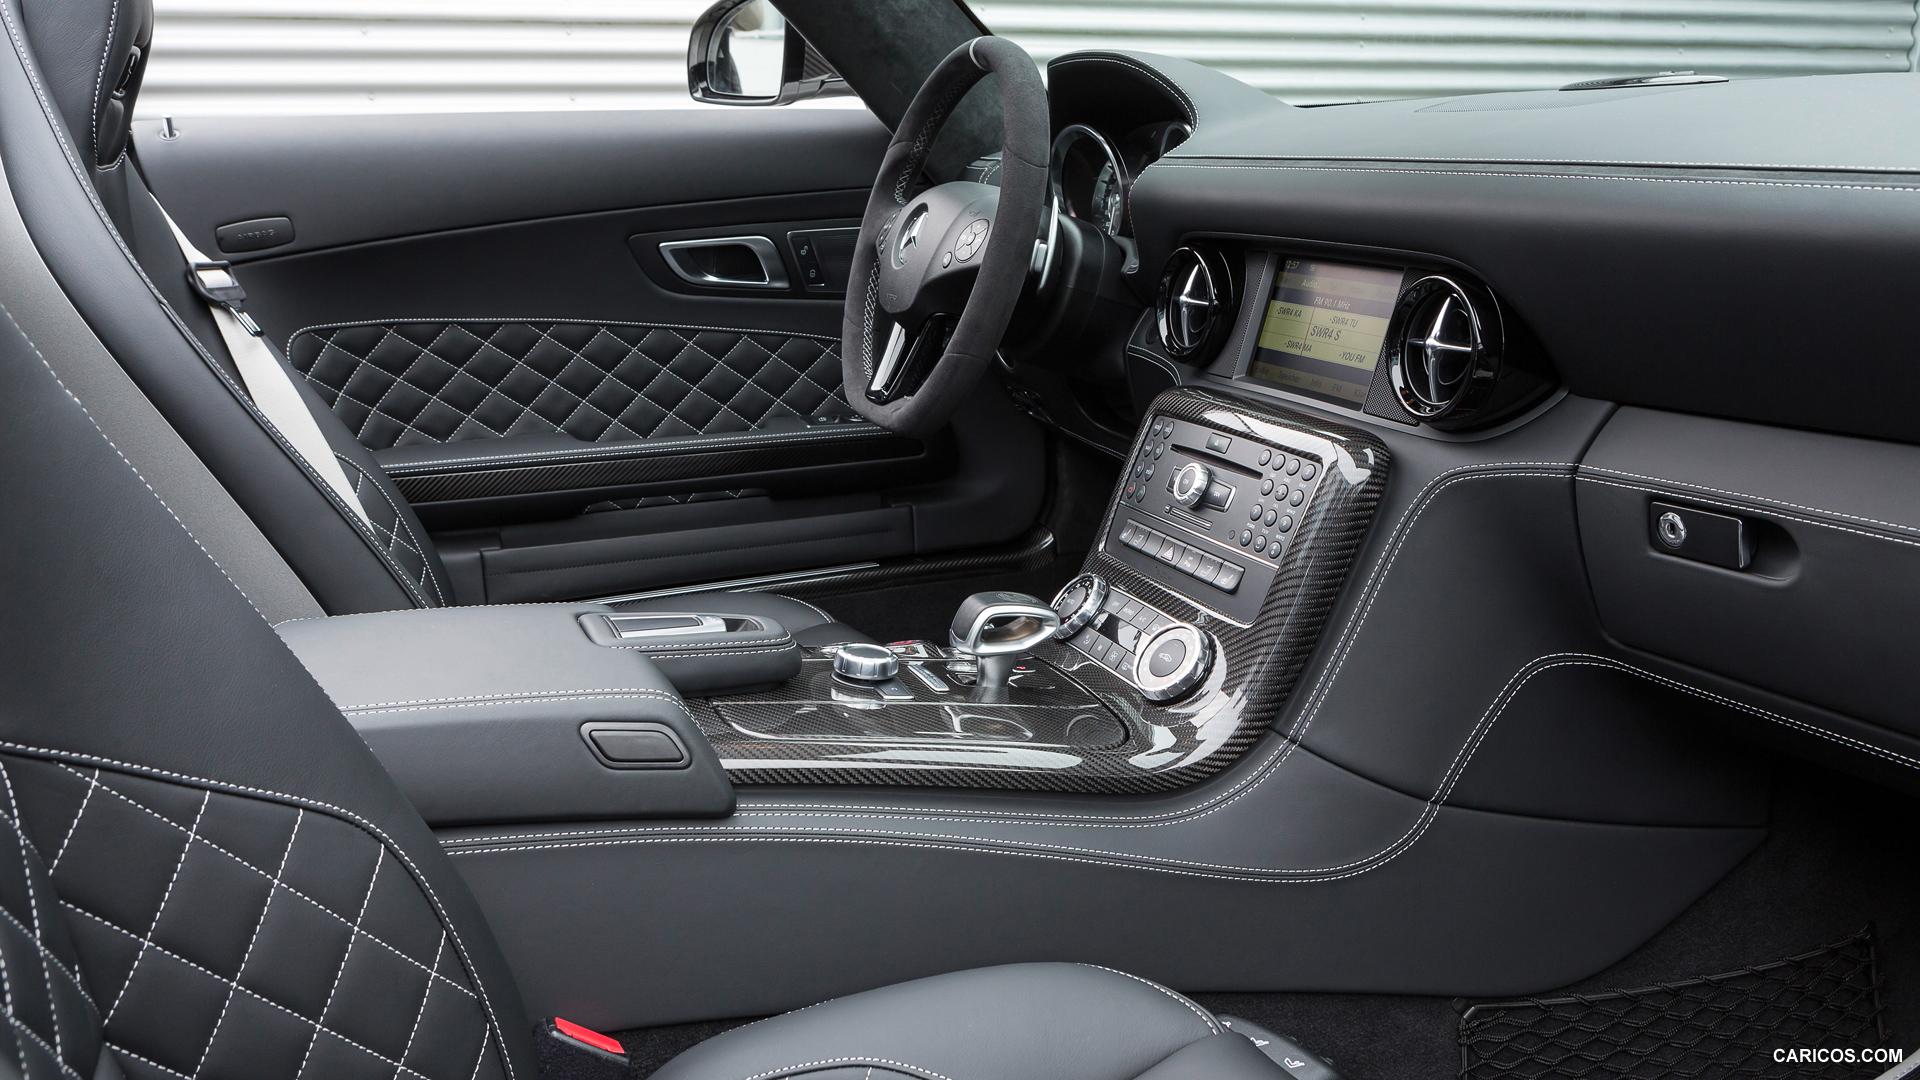 Alfa img showing gt sls amg gt roadster interior -  Mercedes Benz Sls Amg Gt Final Edition 20